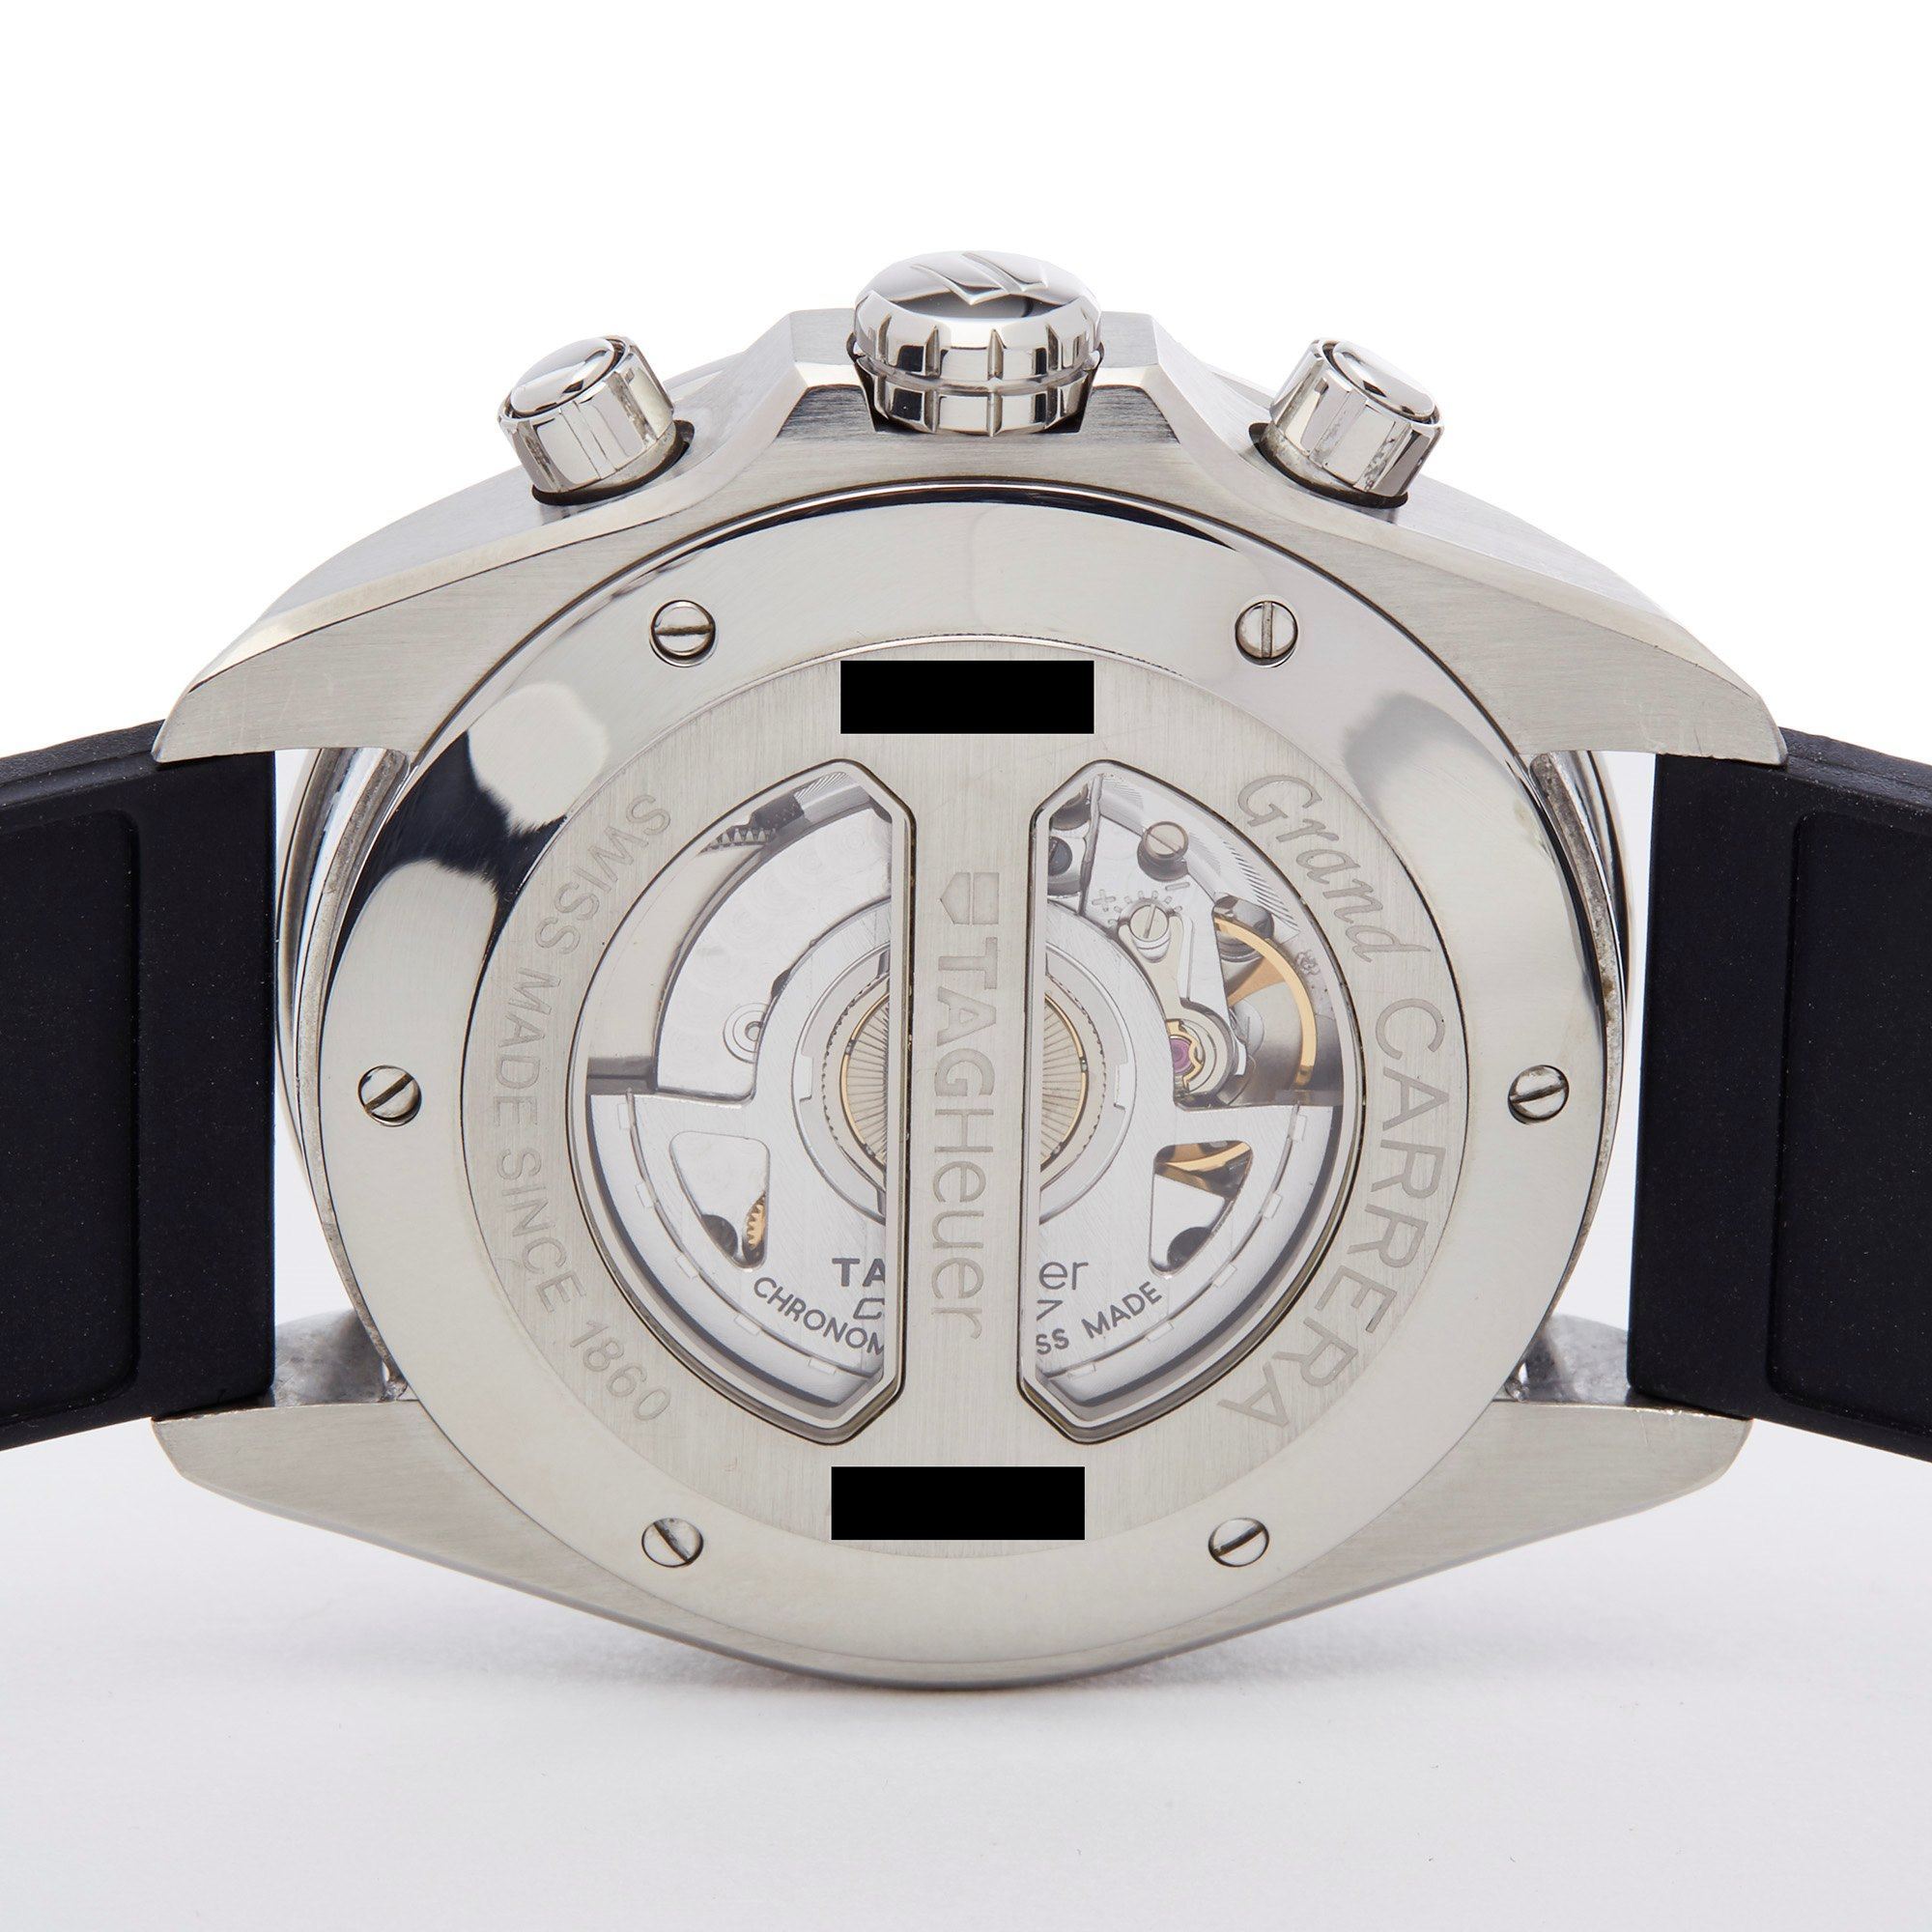 Tag Heuer Grand Carrera Chronograph Stainless Steel CAV511B